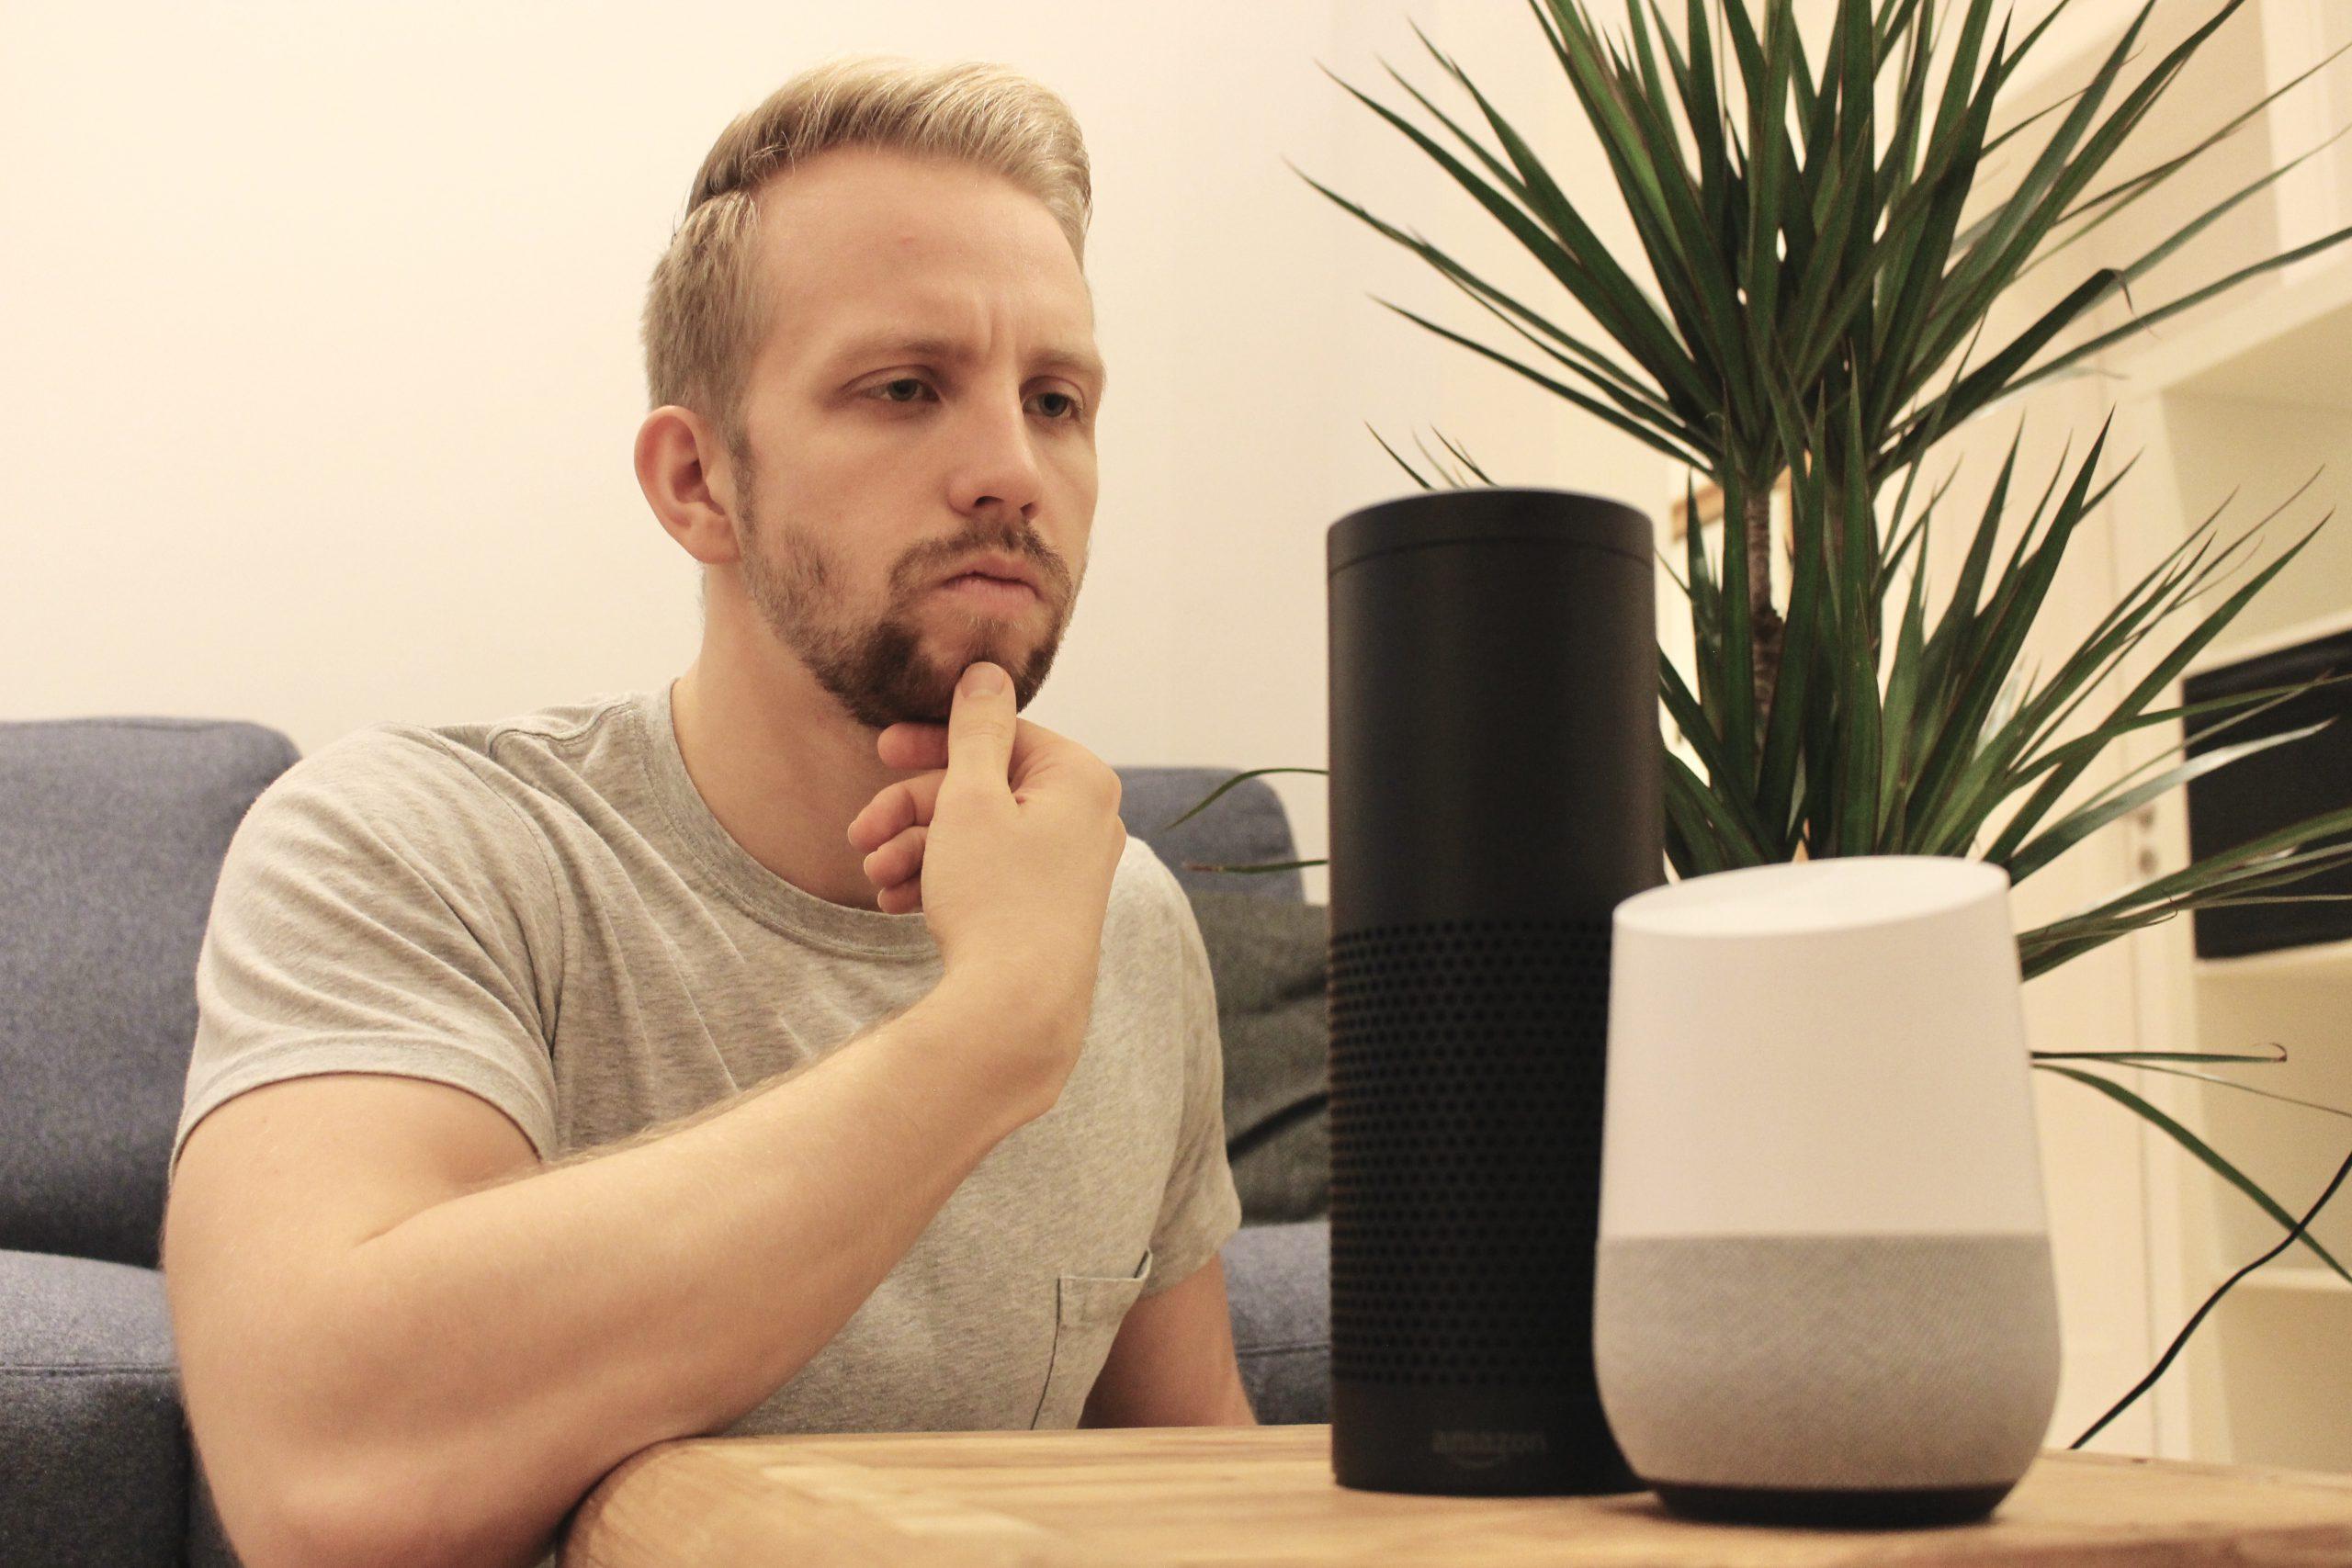 Datenschutz im Smart Home